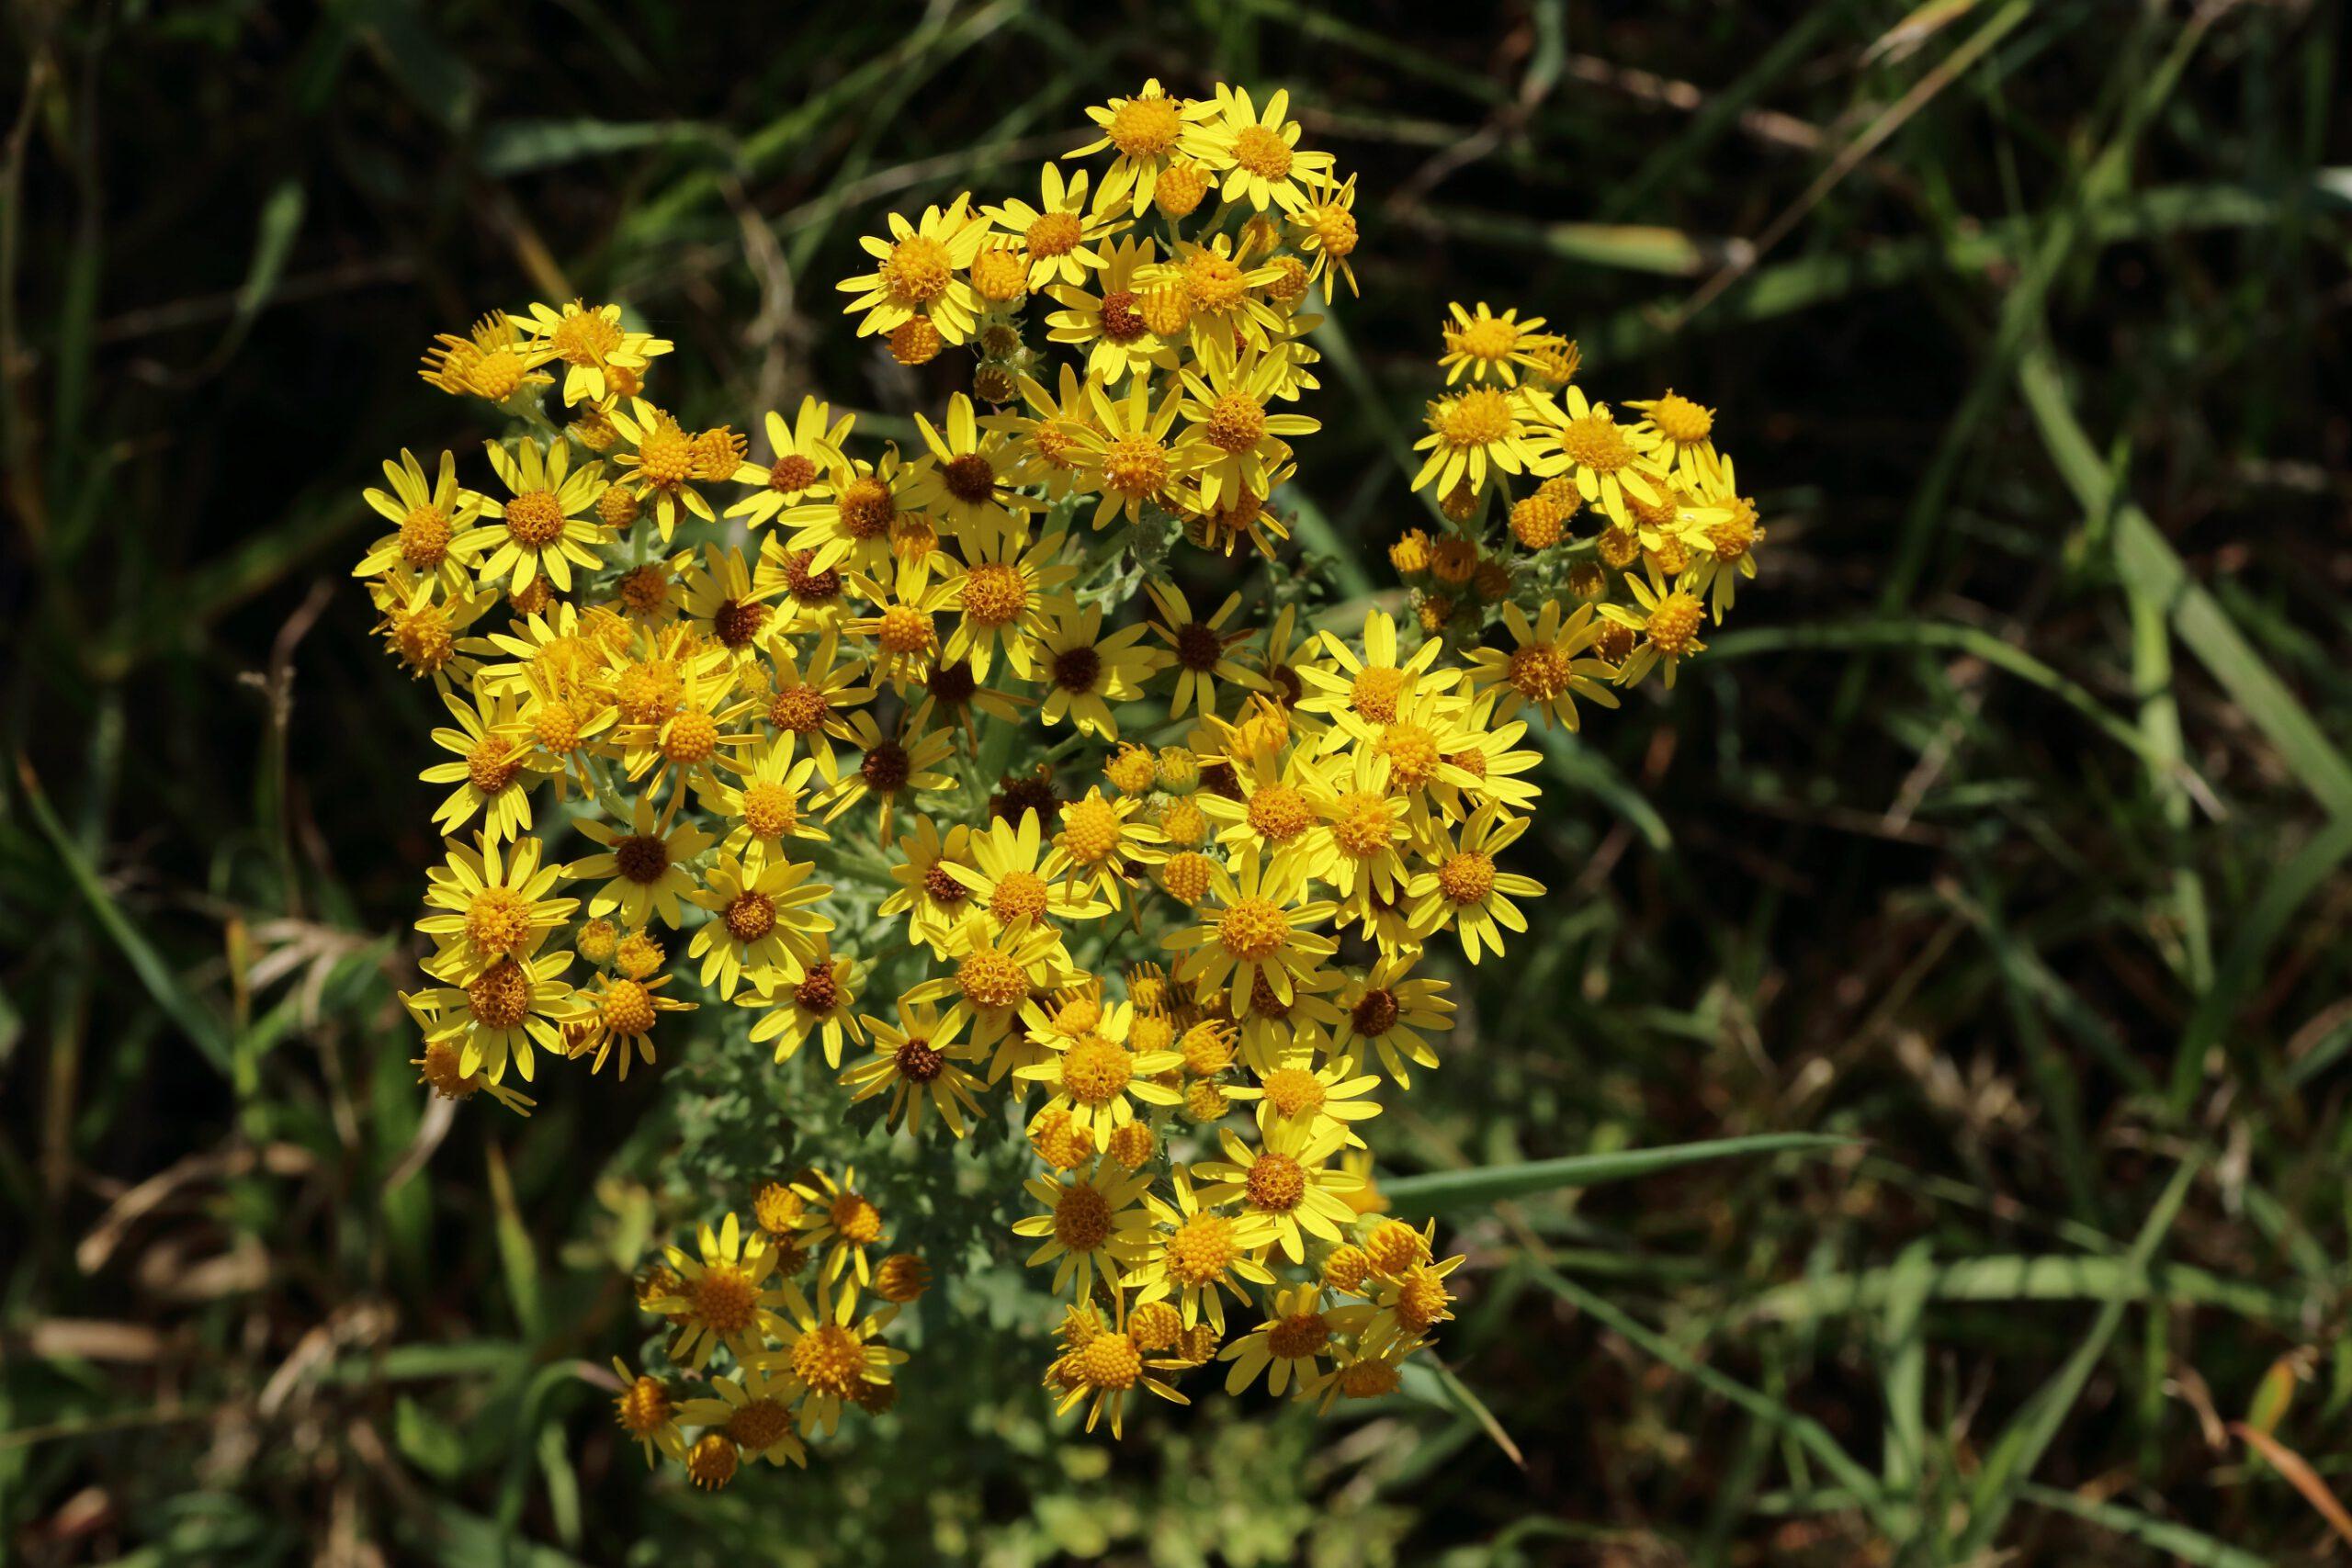 Jakobs-Greiskraut - Blütenstand